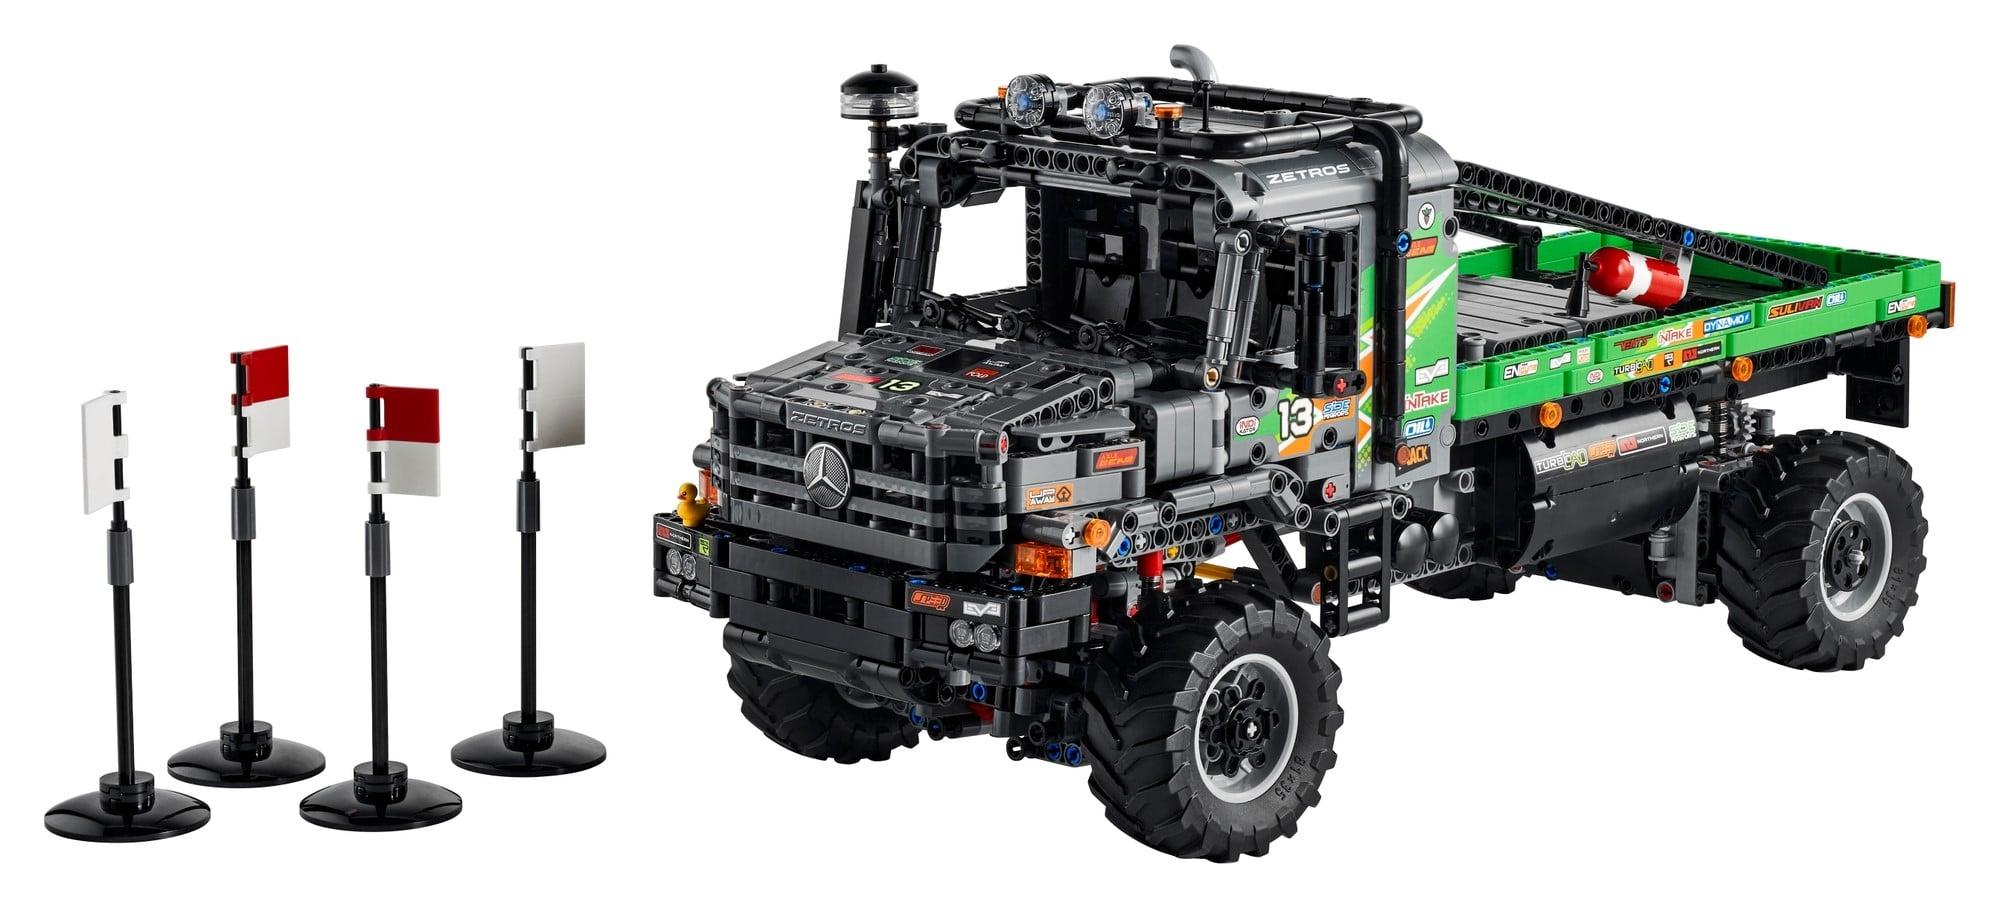 LEGO Technic 42129 4x4 Mercedes Benz Zetros Offroad Truck 1